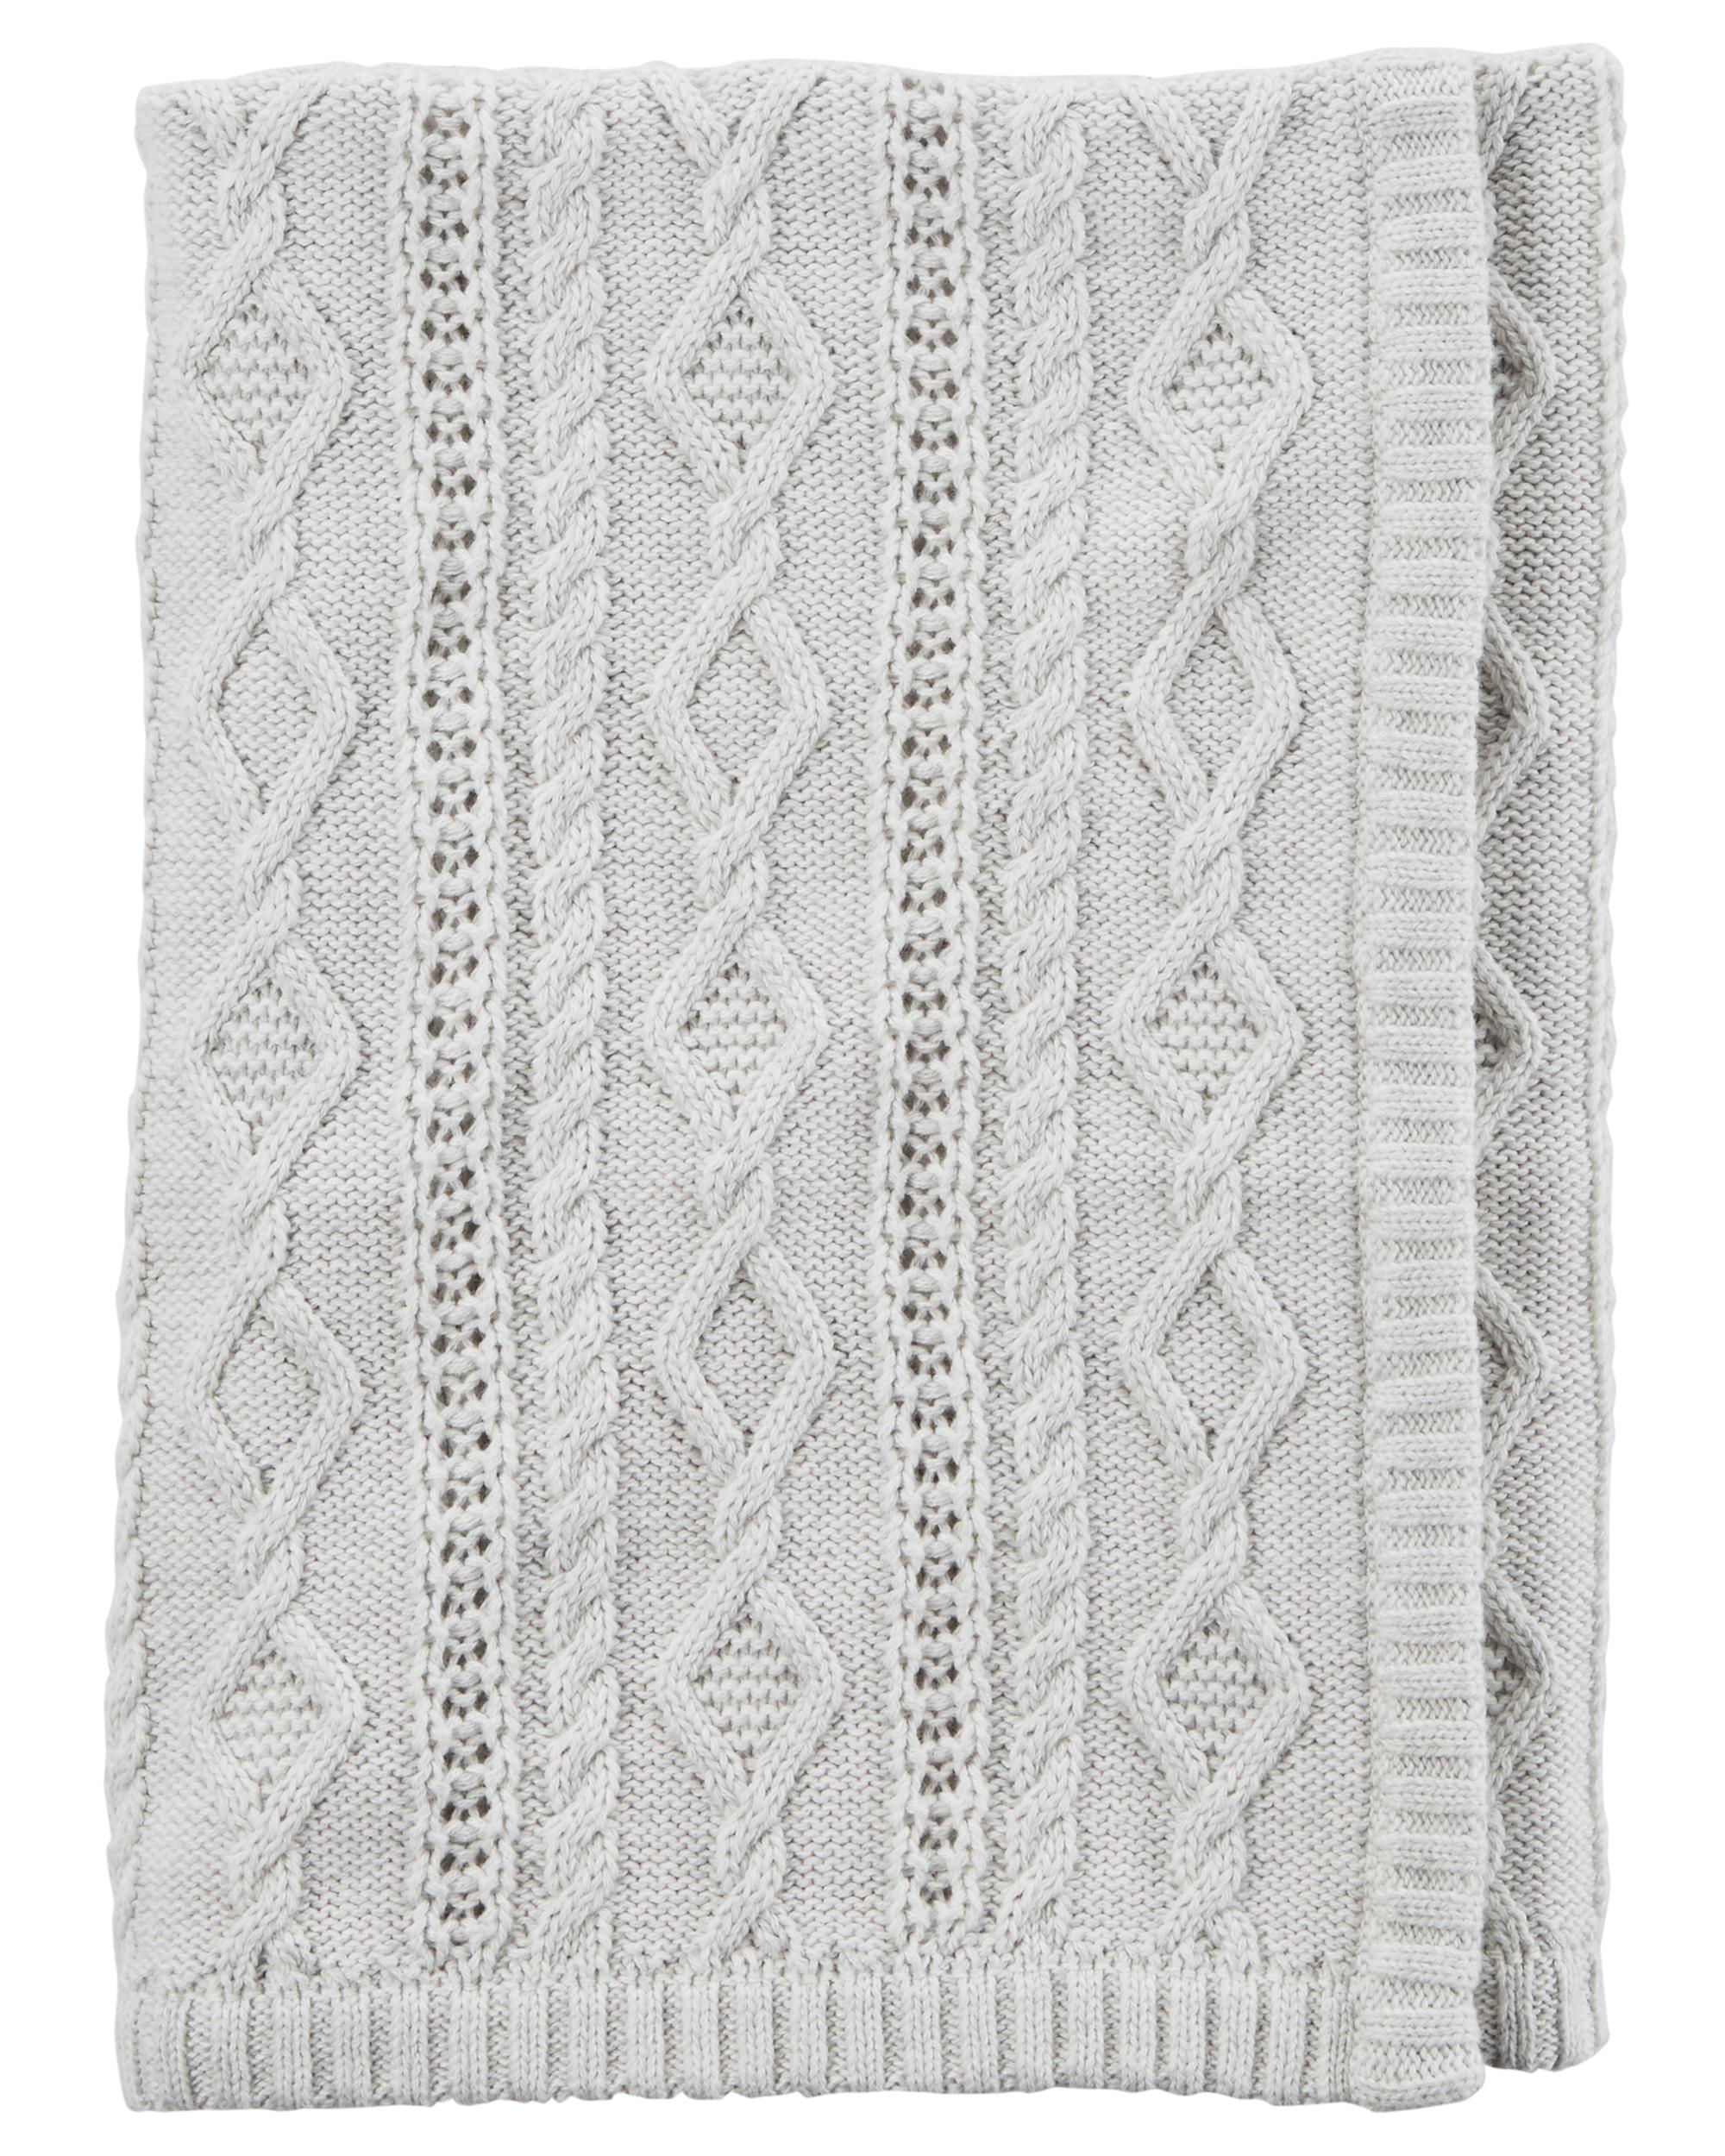 172d2e606 Cable Knit Blanket   carters.com